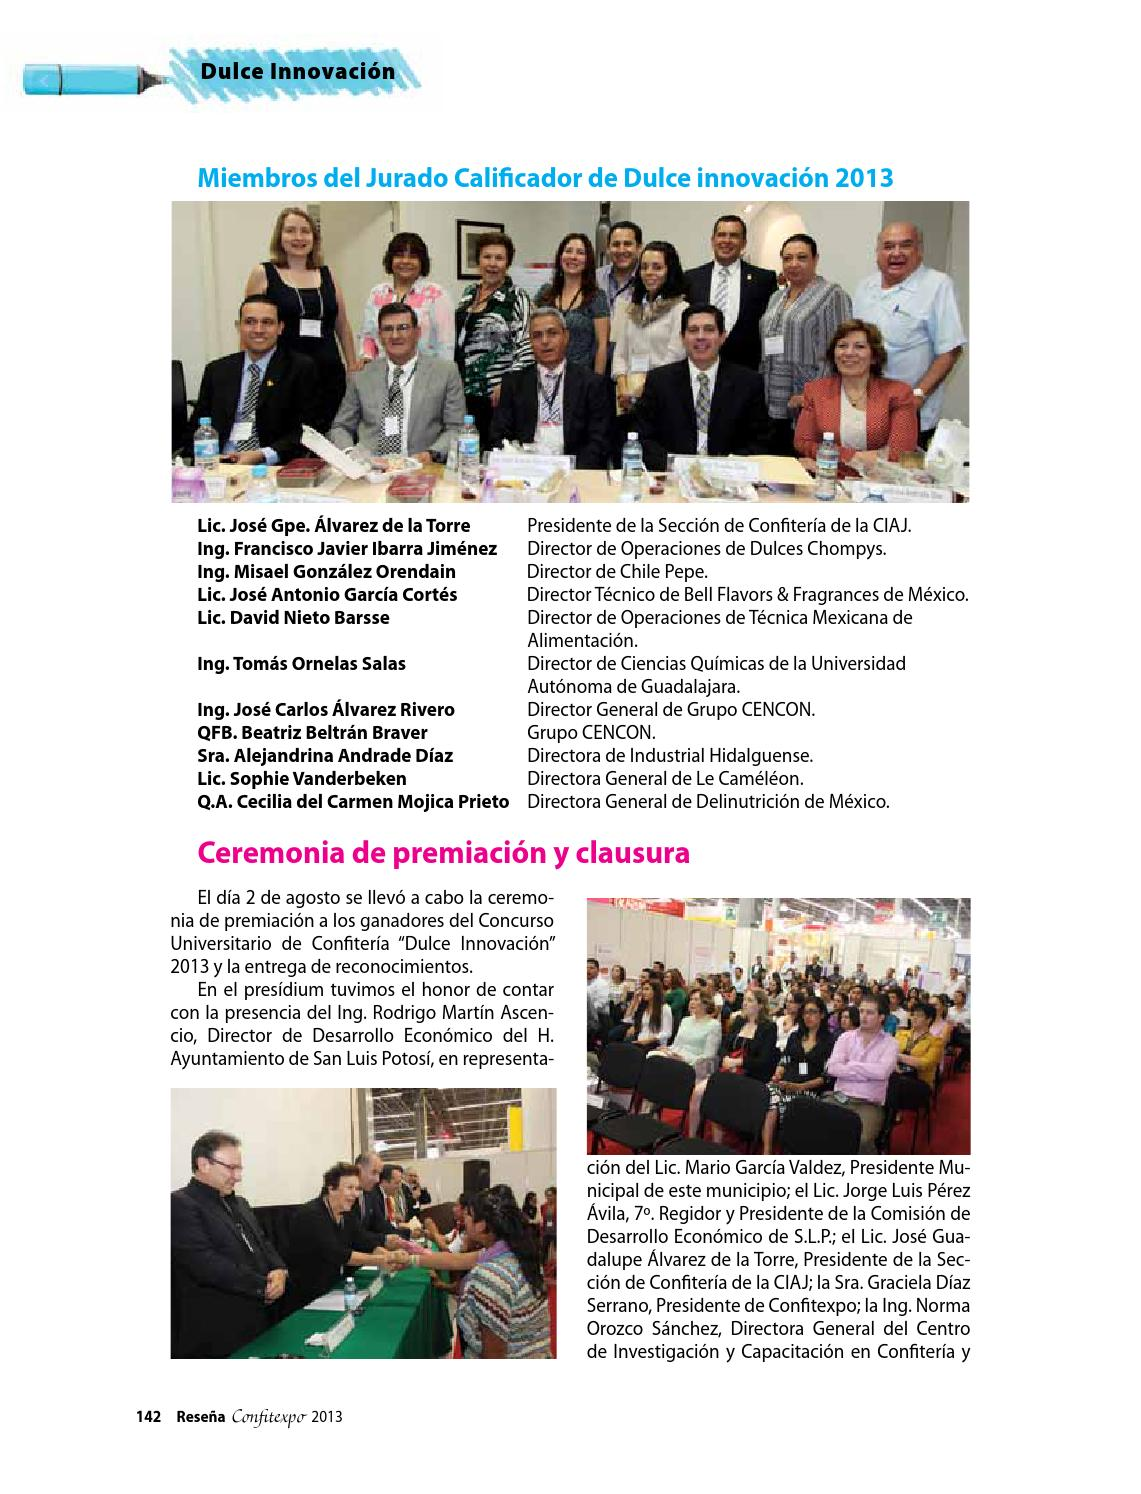 dulcelandia sept oct 2013 by producciones manila sa de cv